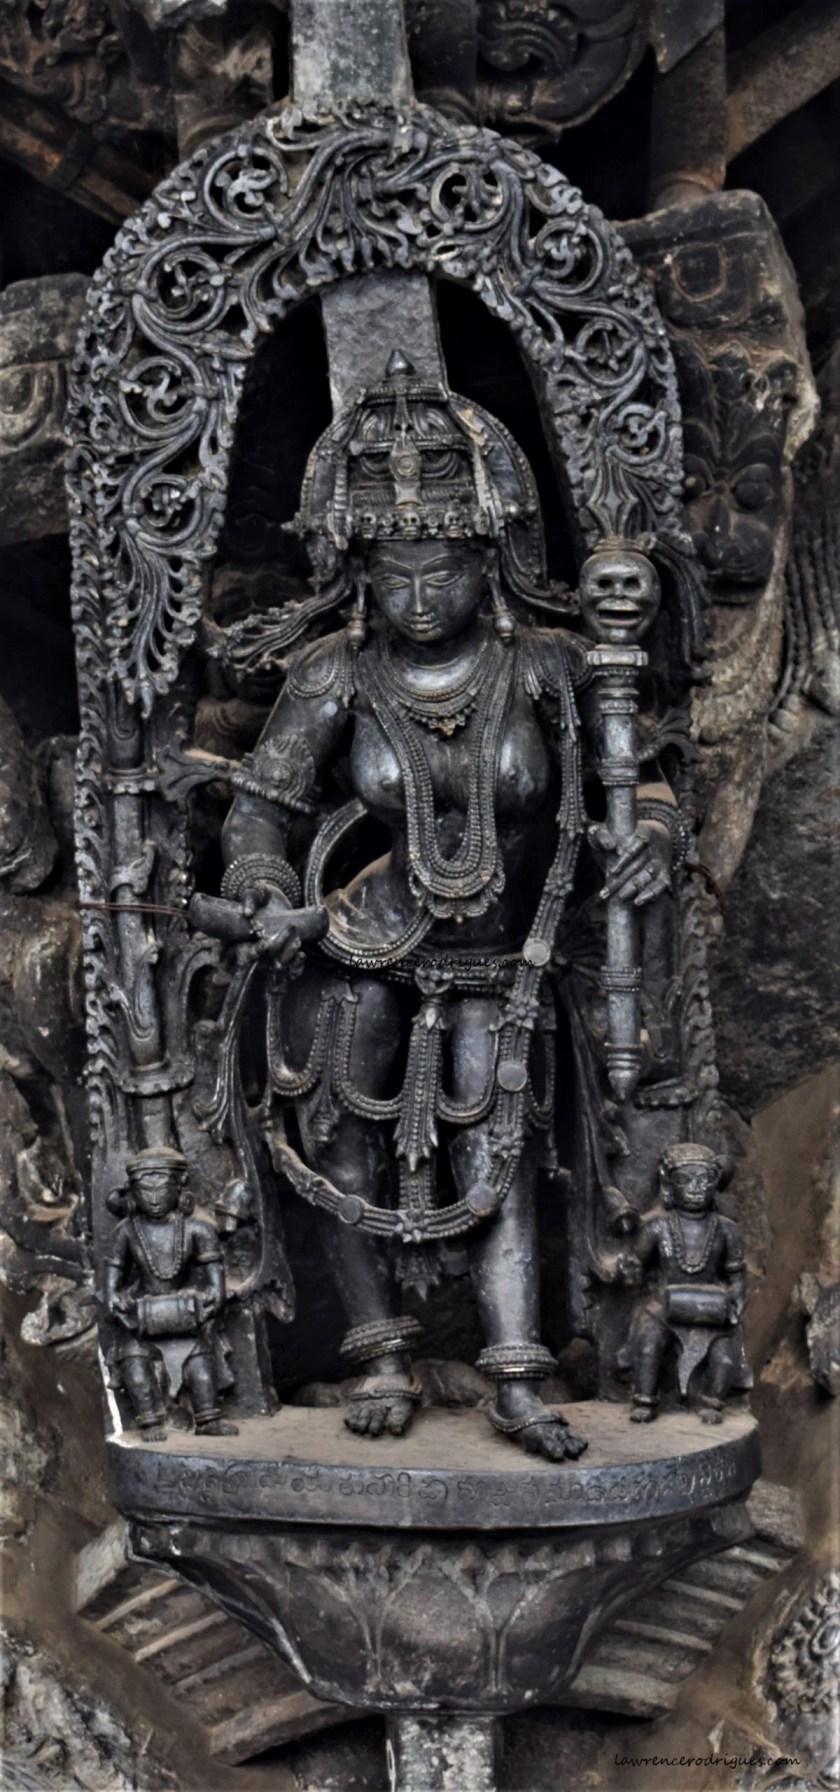 Kapala Durga - A bracket figure mounted on the exterior wall of the Chennakeshava Temple, Belur, Karnataka